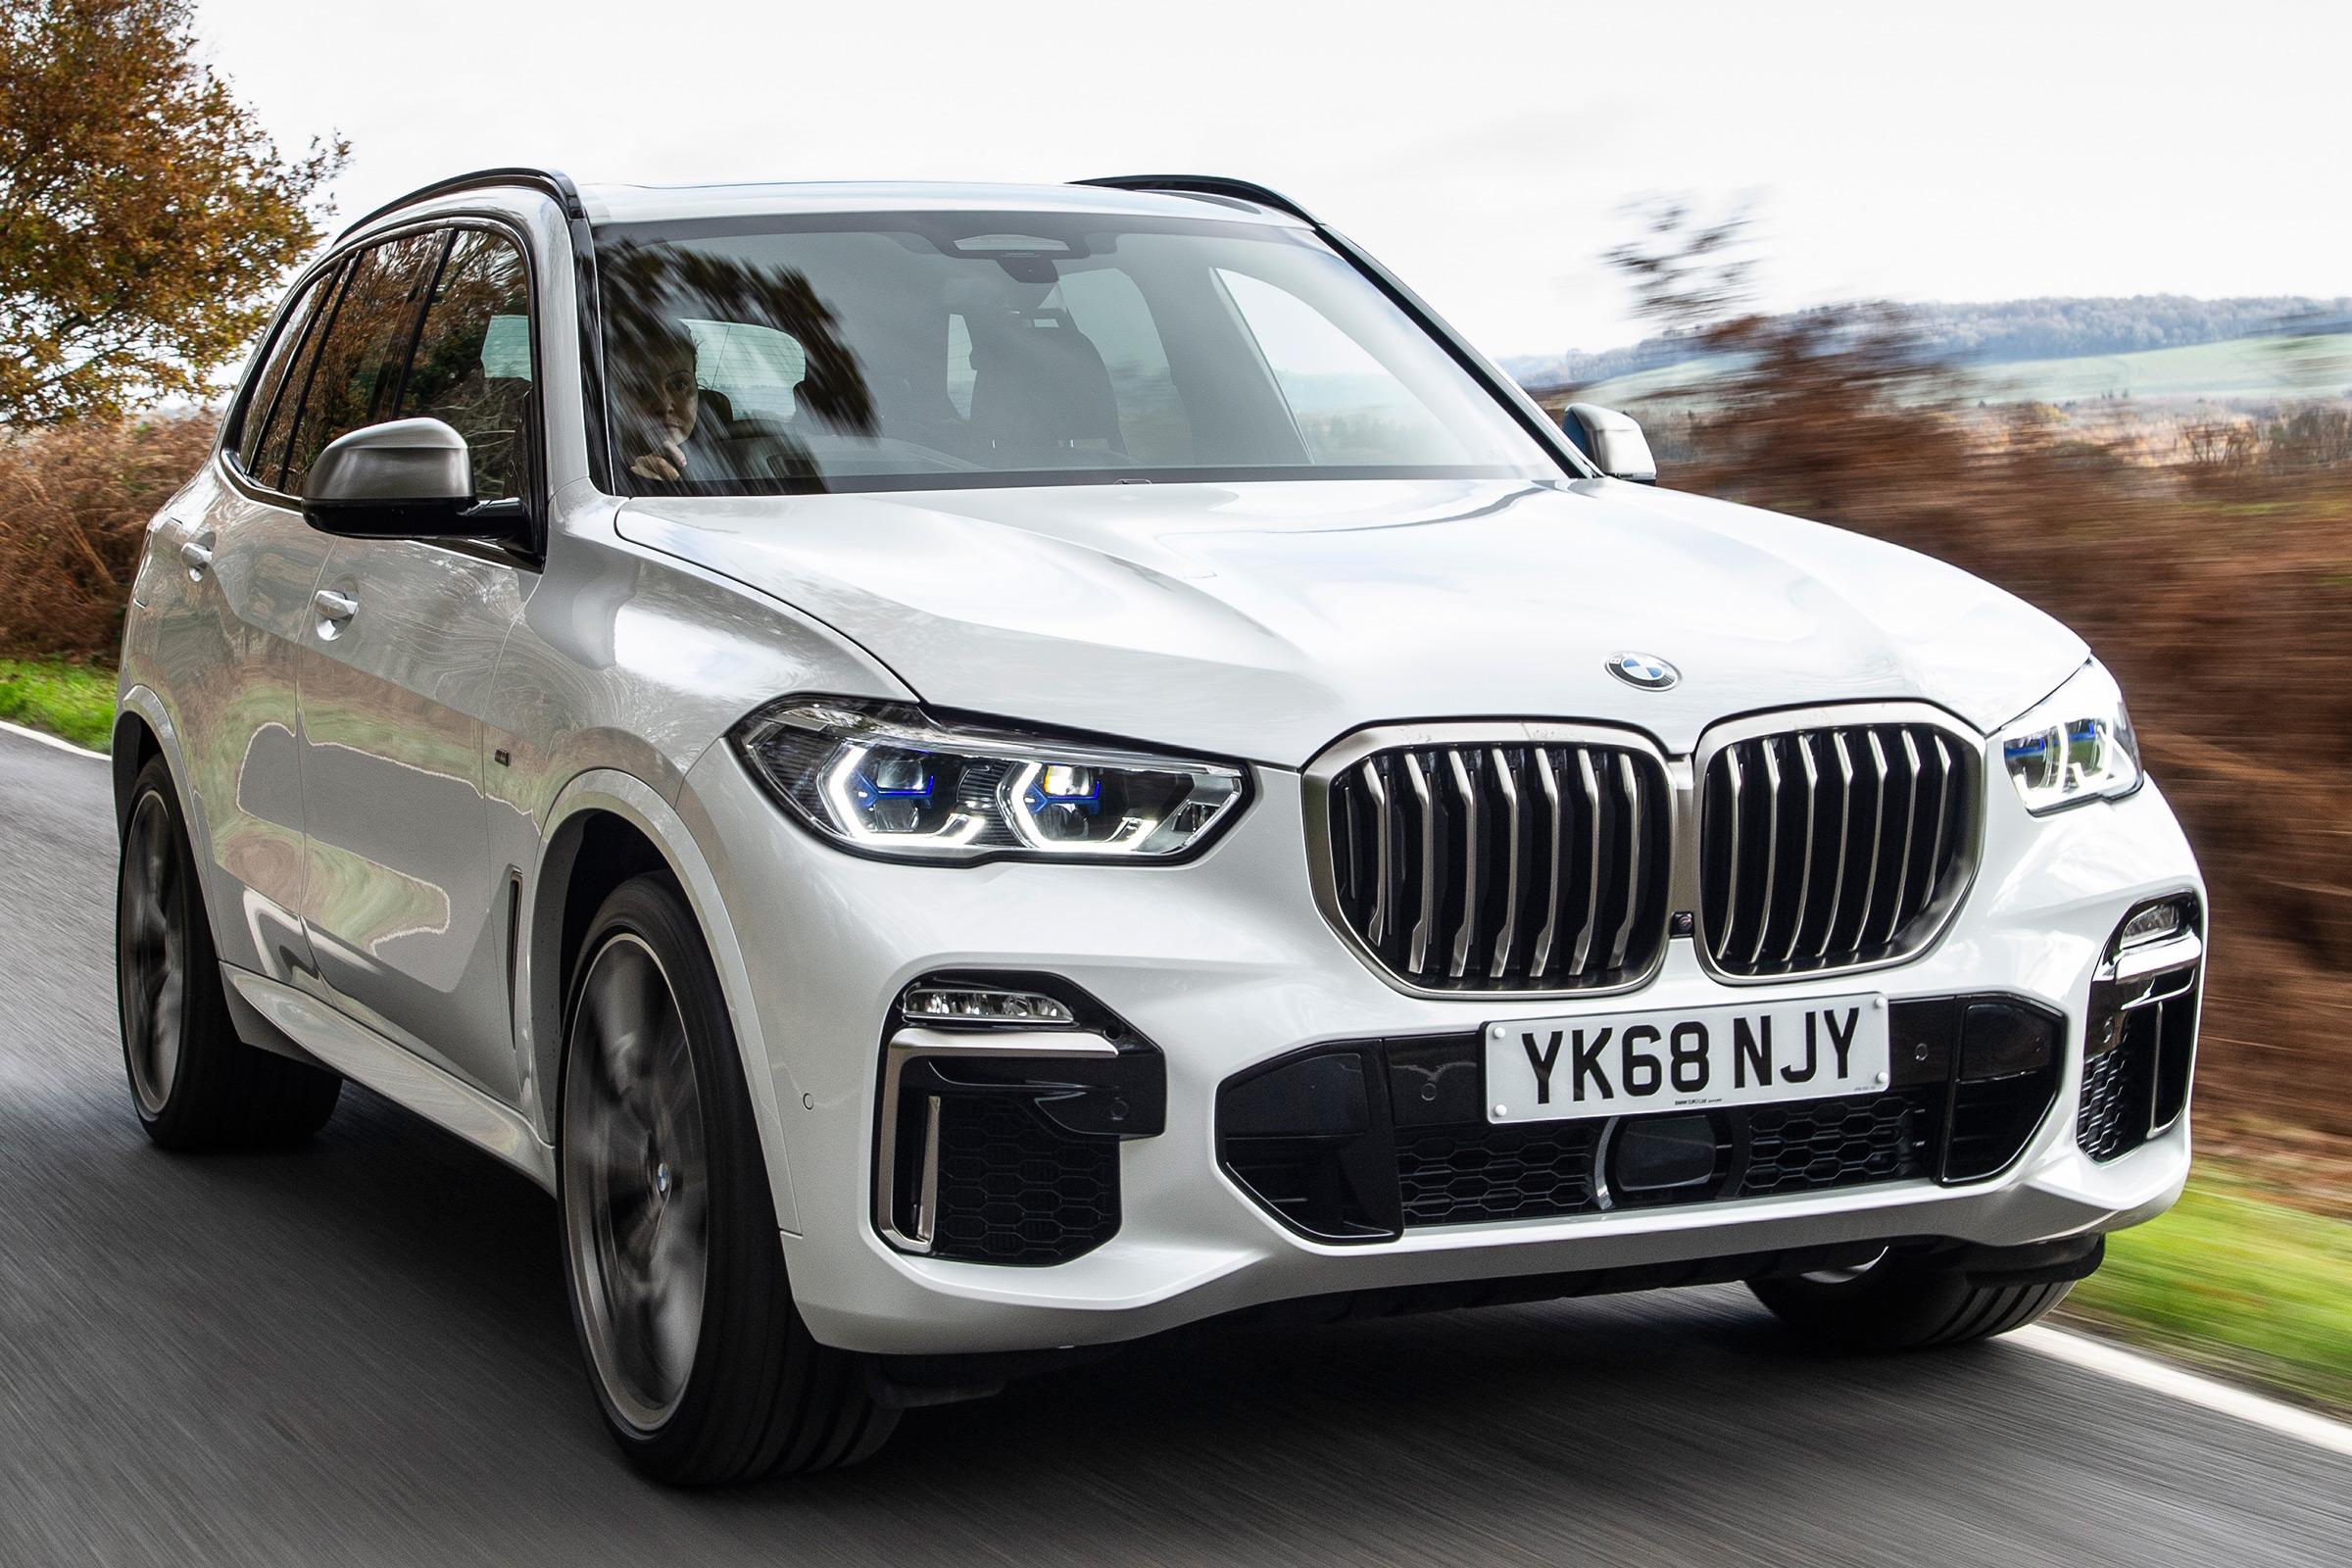 New Bmw X5 M50d 2019 Review Auto Express